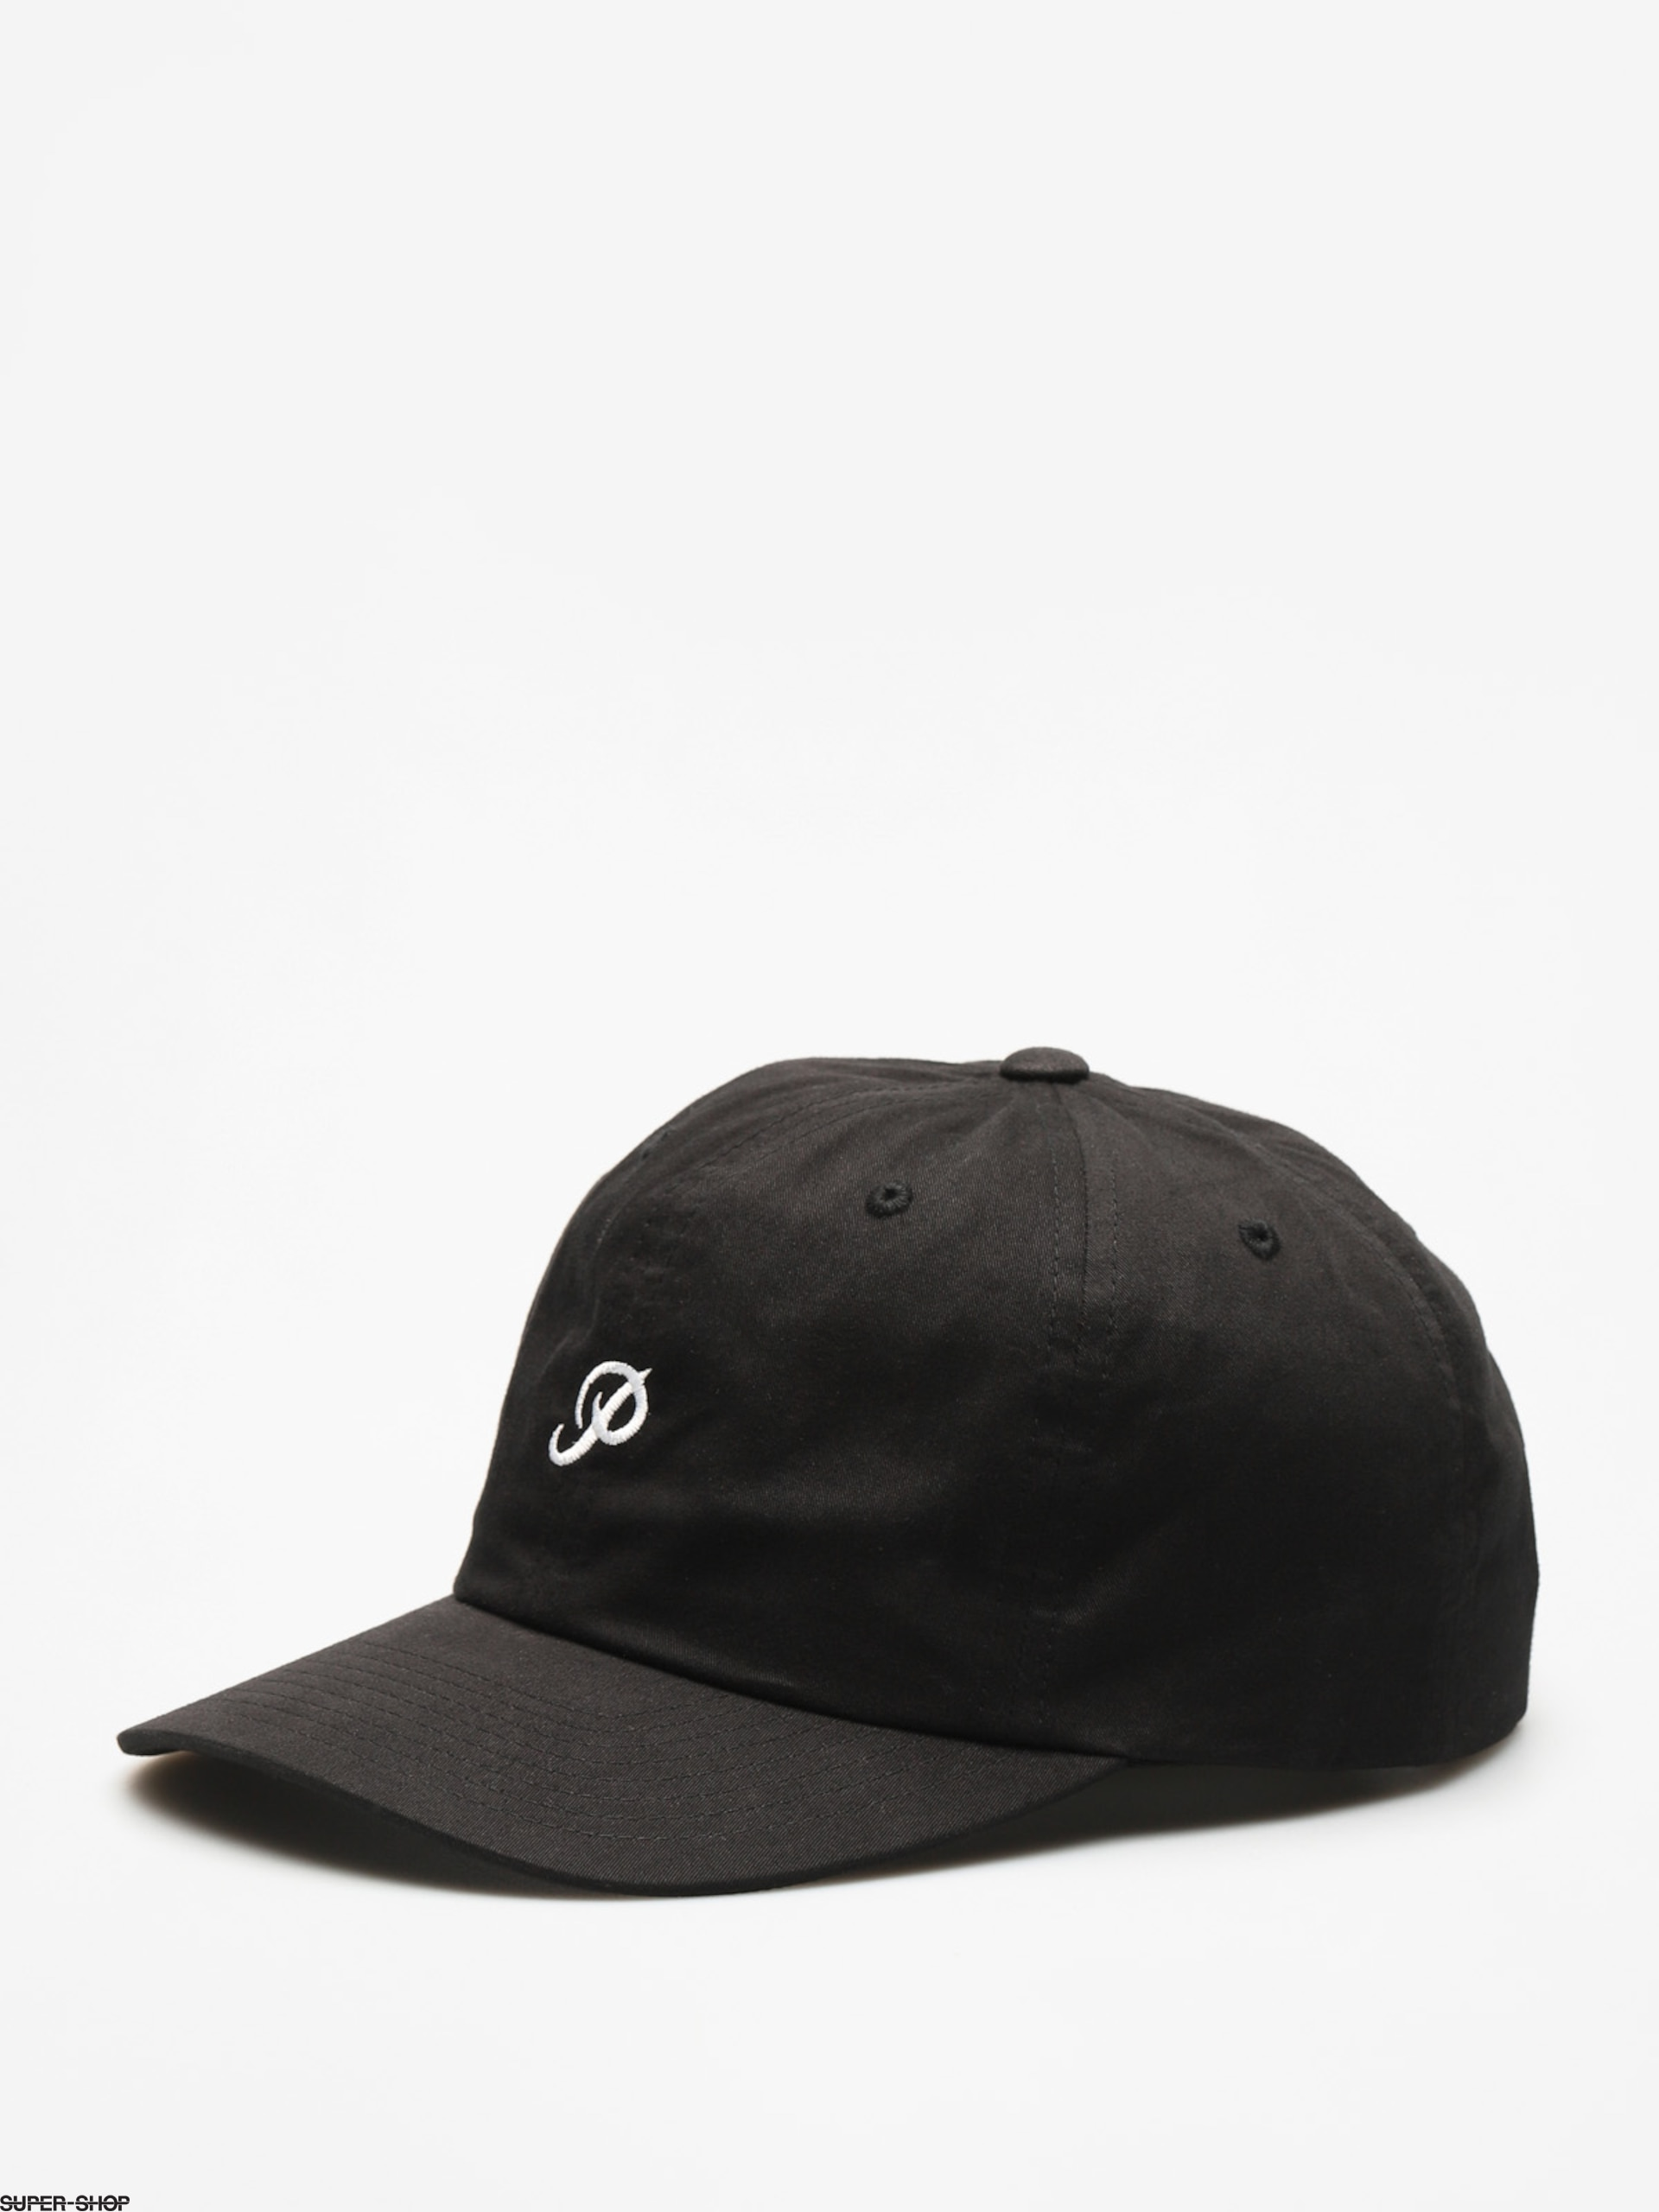 926873-w1920-primitive-cap-mini-classic-dad-hat-zd-black.jpg 138863c66d6